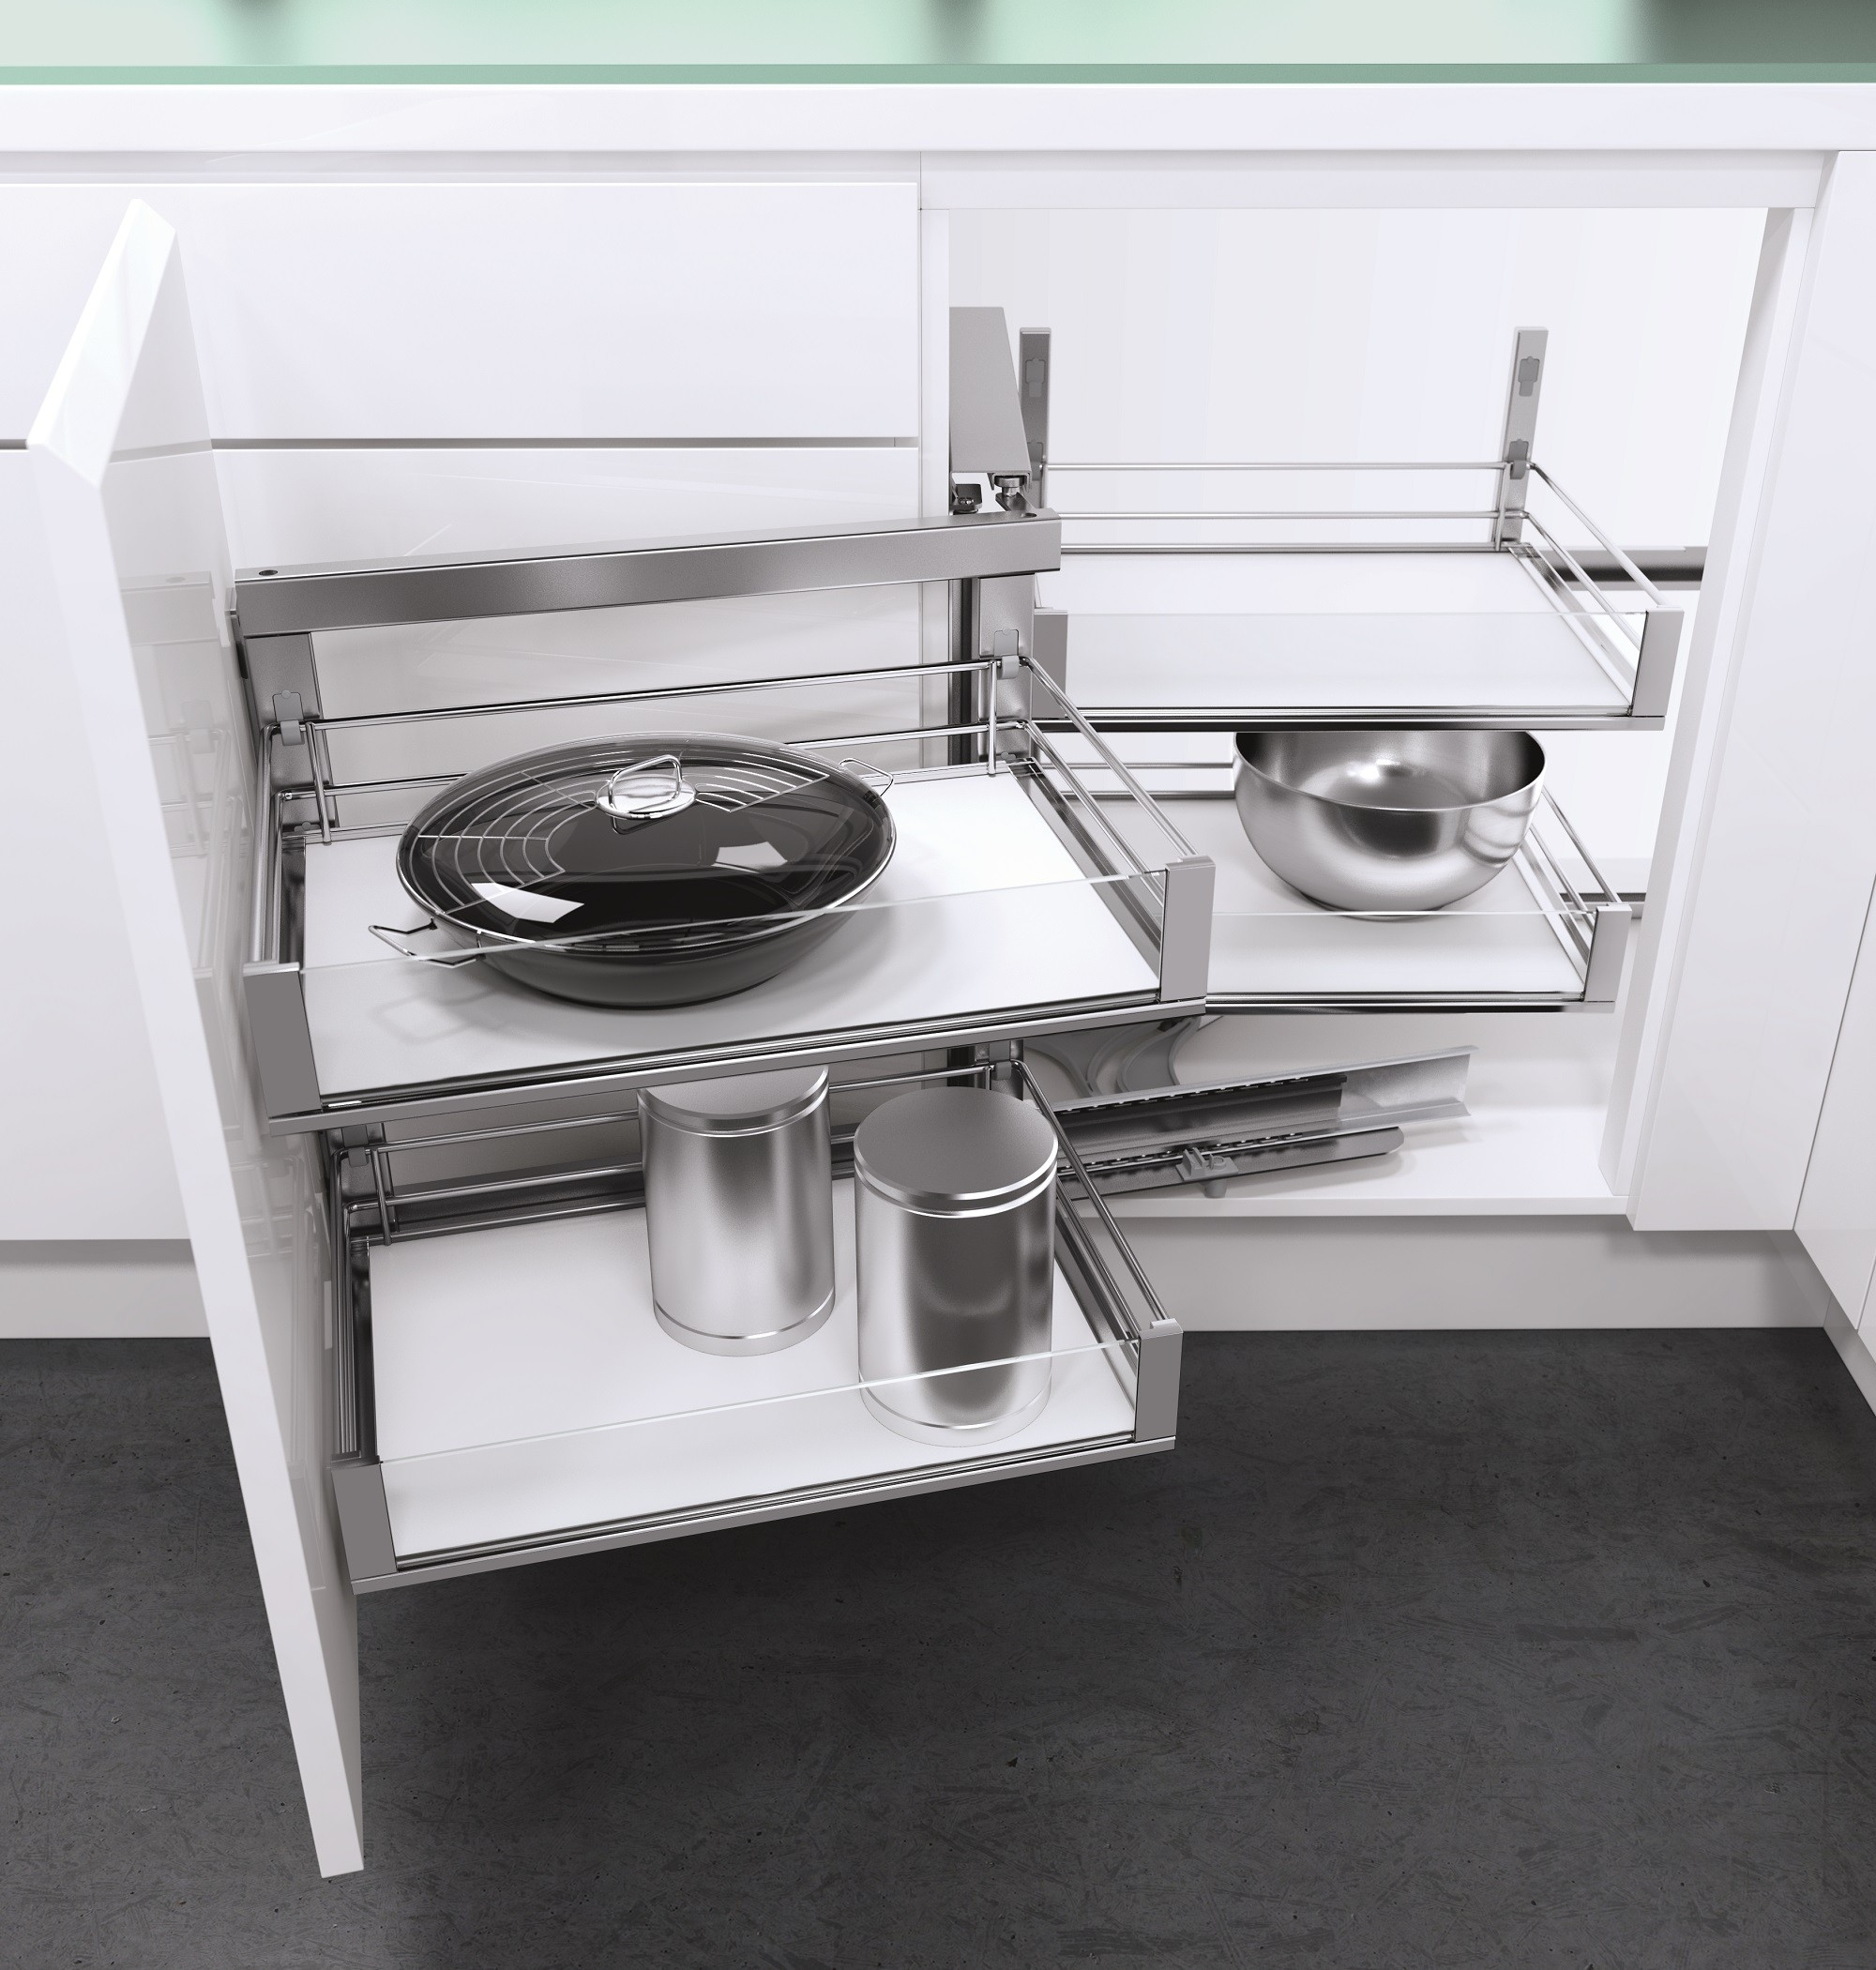 Kitchen Storage Space Hassles? Turn the Corner with Vauth-Sagel